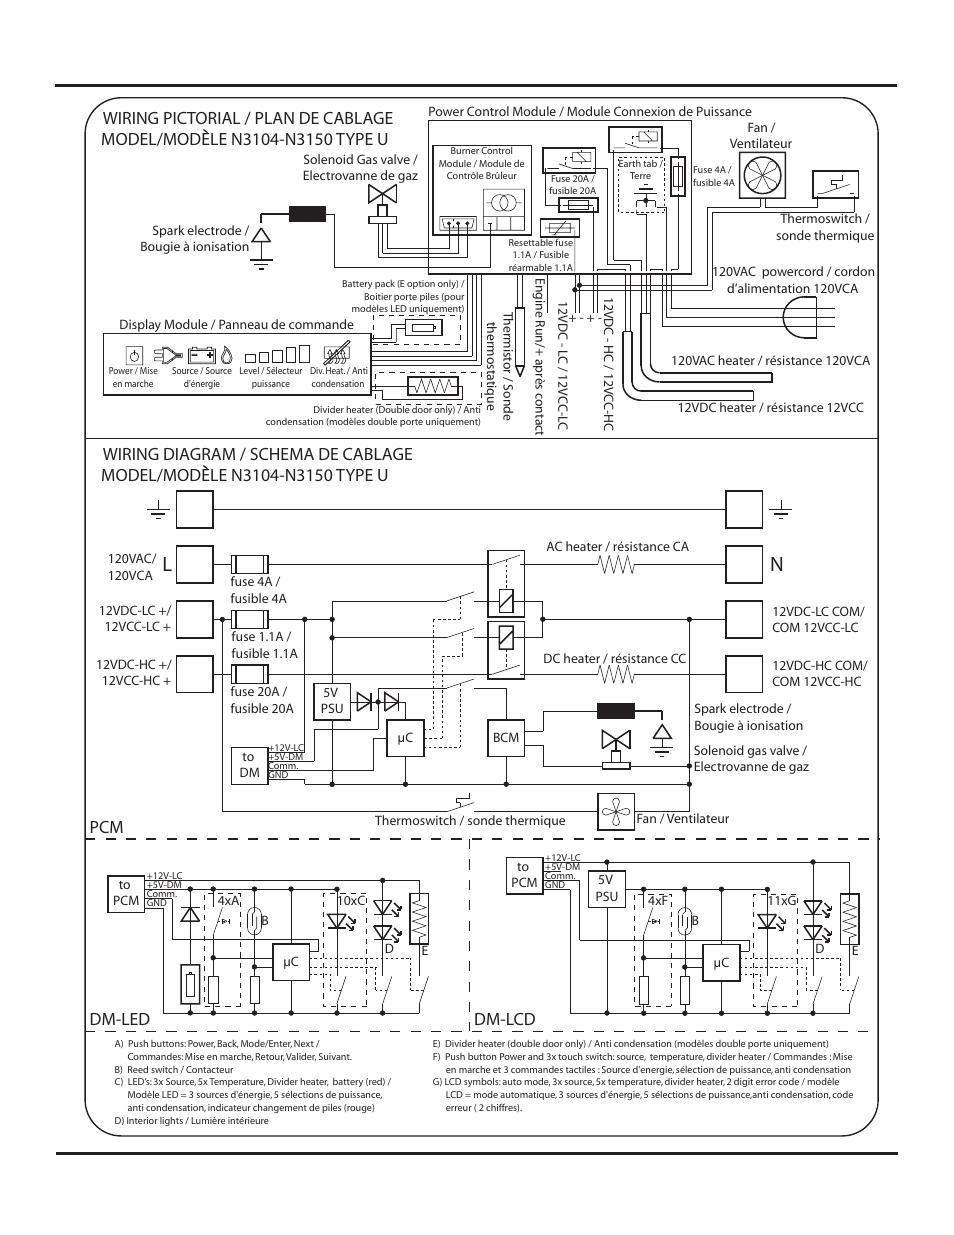 1992 Lexus Ls400 Parts Diagram Printable Wiring Diagram Schematic